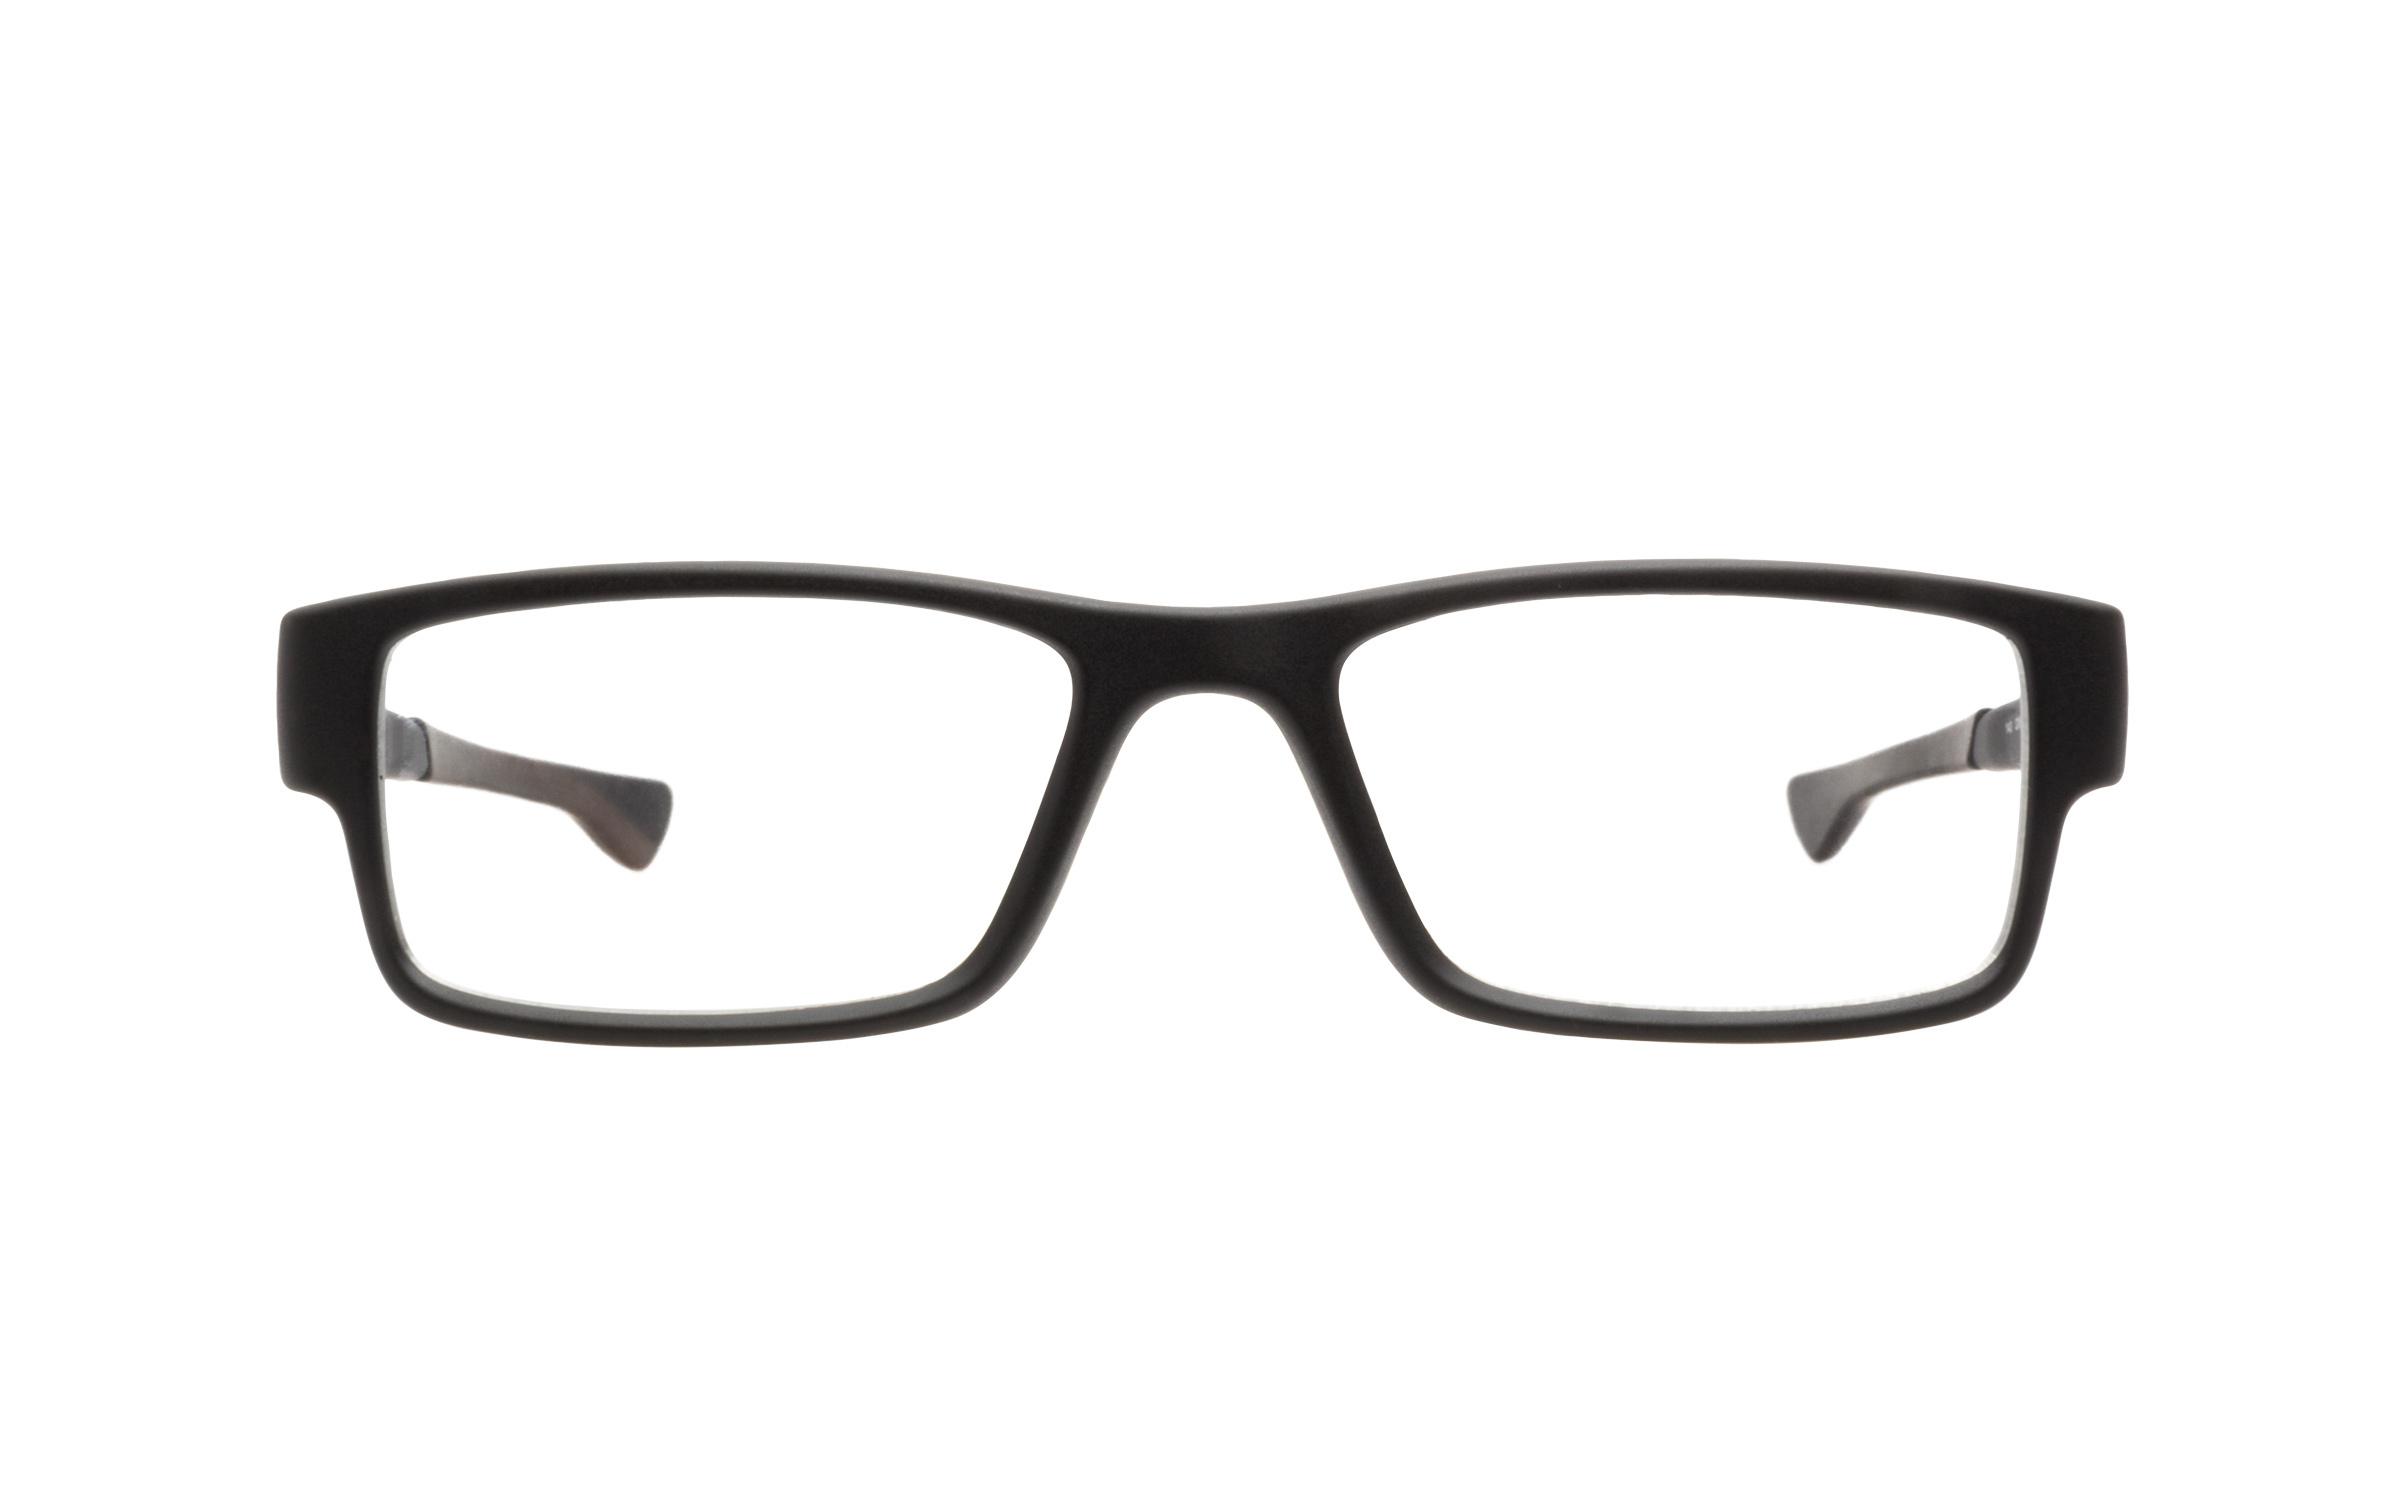 Oakley OX8046 01 55 Eyeglasses and Frame in Satin Black | Acetate - Online Coastal